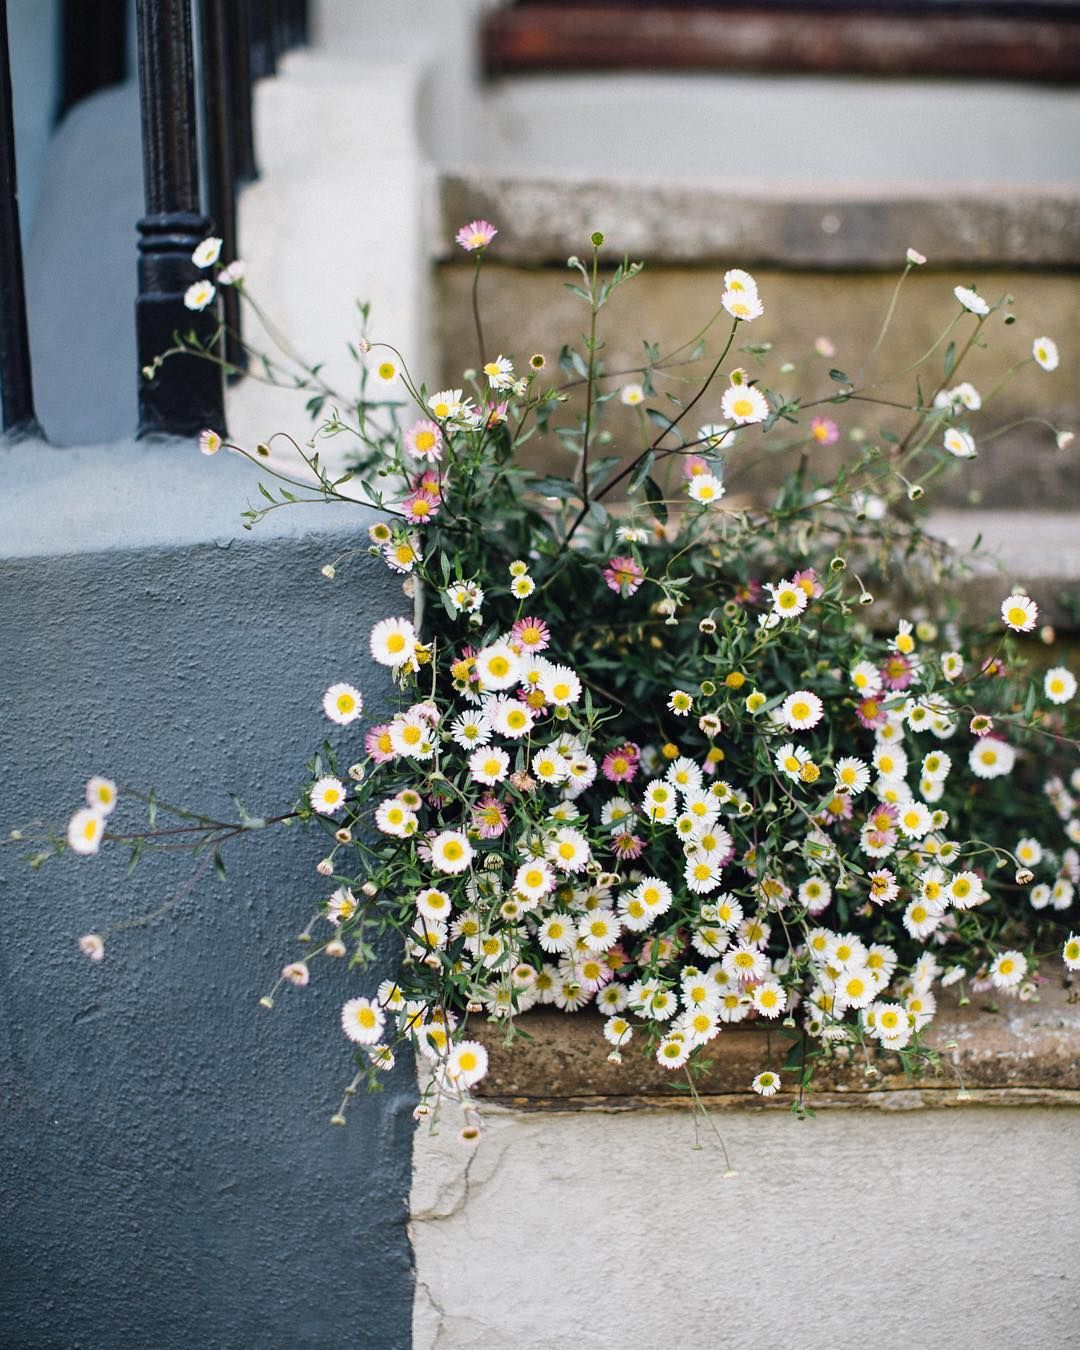 Pin By Zosia Dabrowski On Pretty Things Pinterest Flower